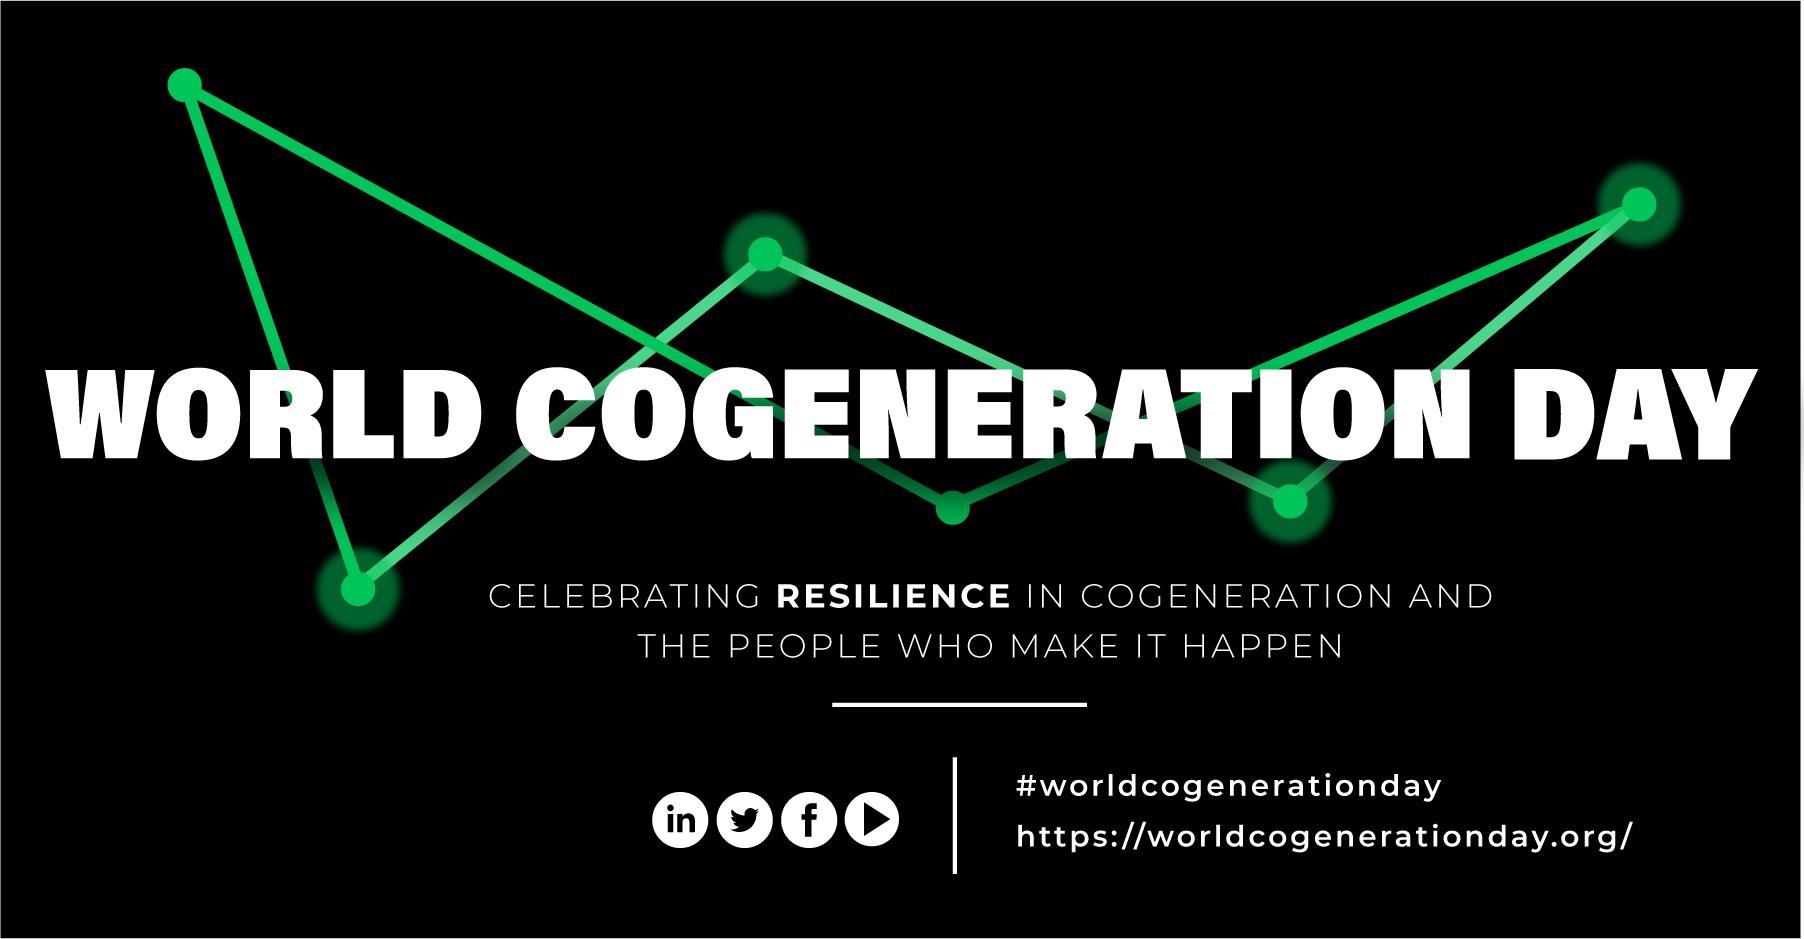 World Cogeneration Day